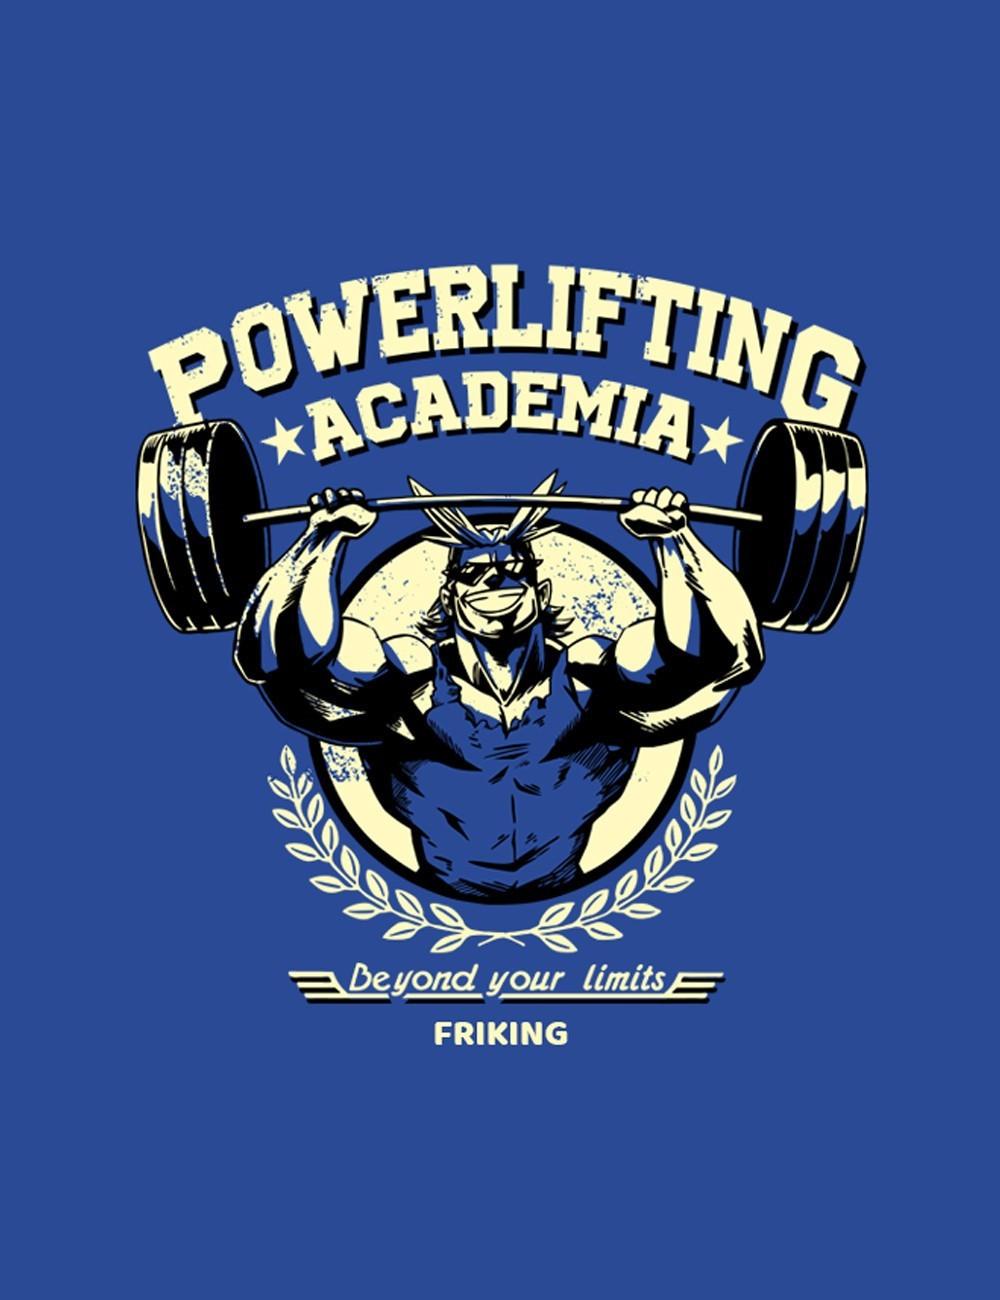 Powerlifting Academy